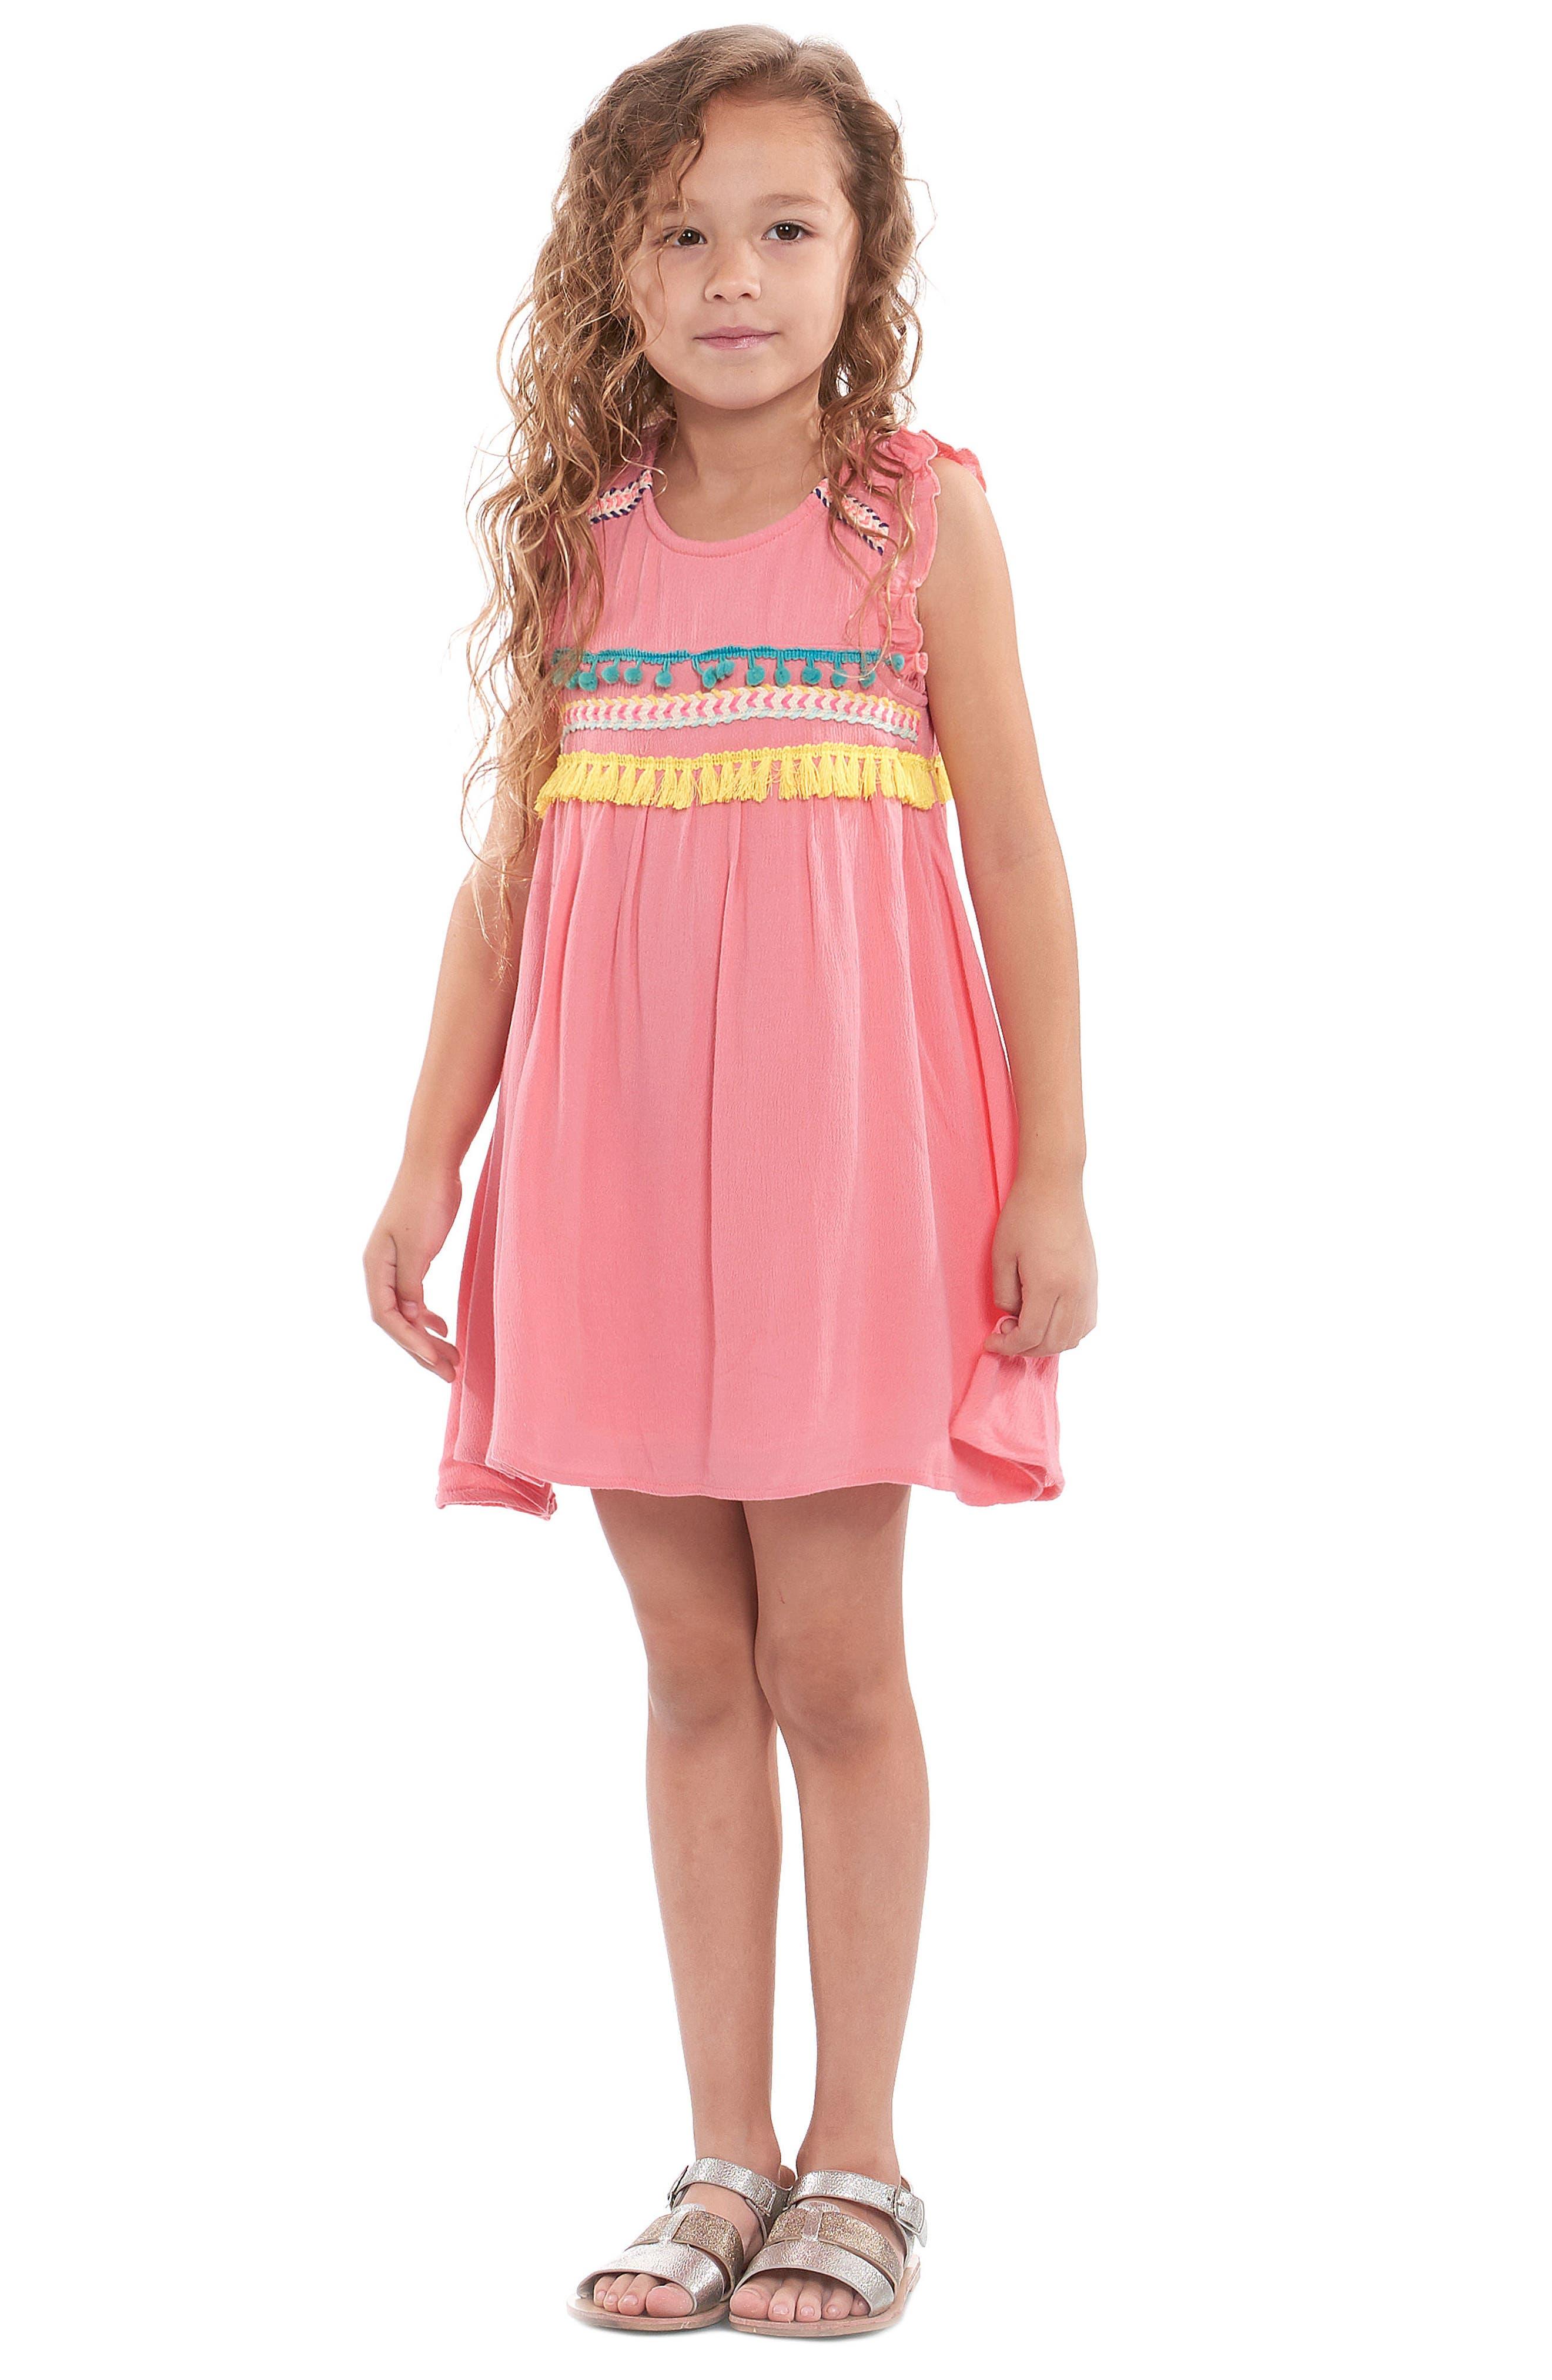 Trim Babydoll Dress,                             Alternate thumbnail 2, color,                             951